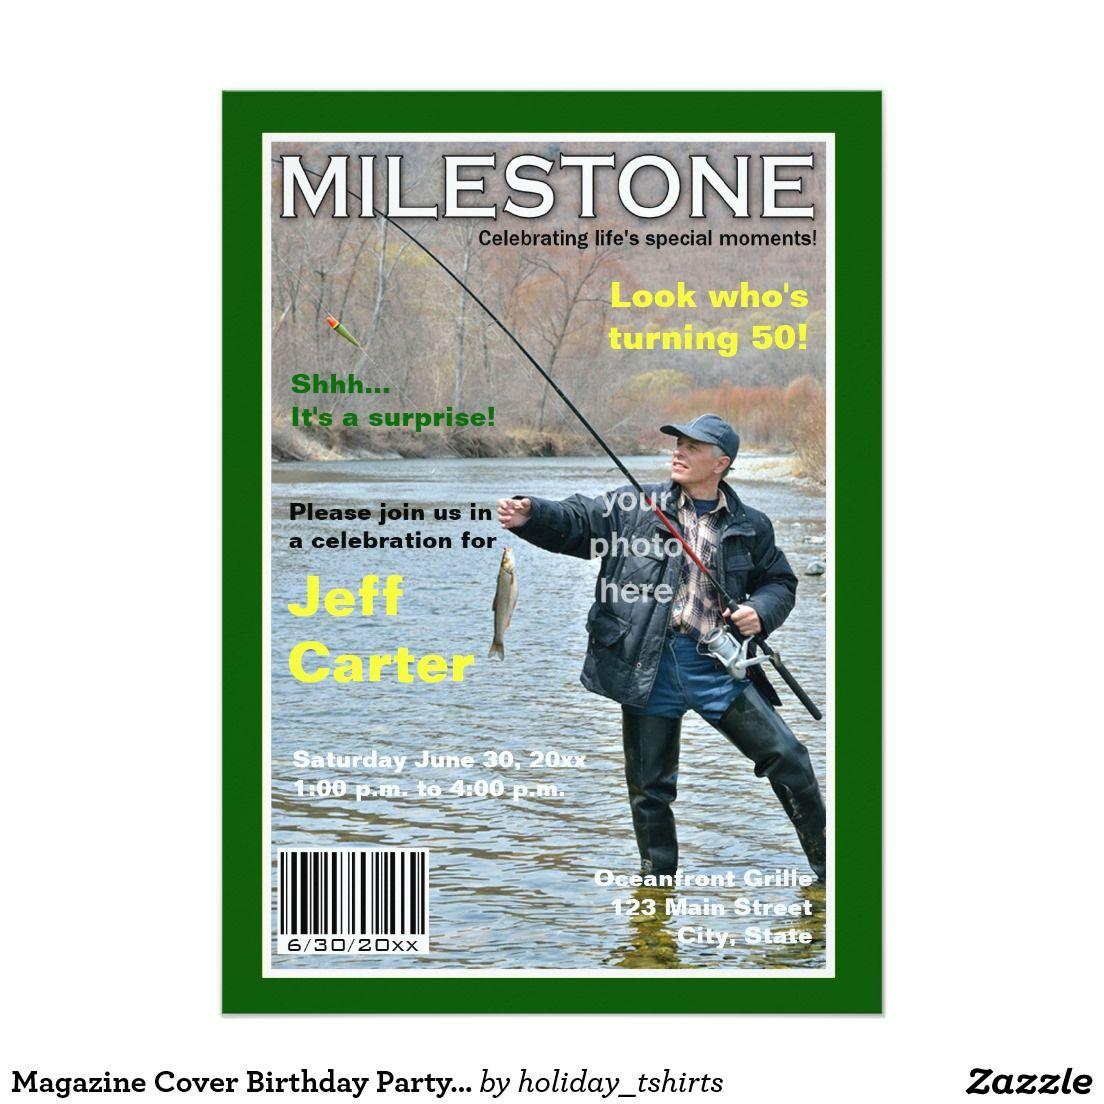 Magazine Cover Birthday Party Invitation